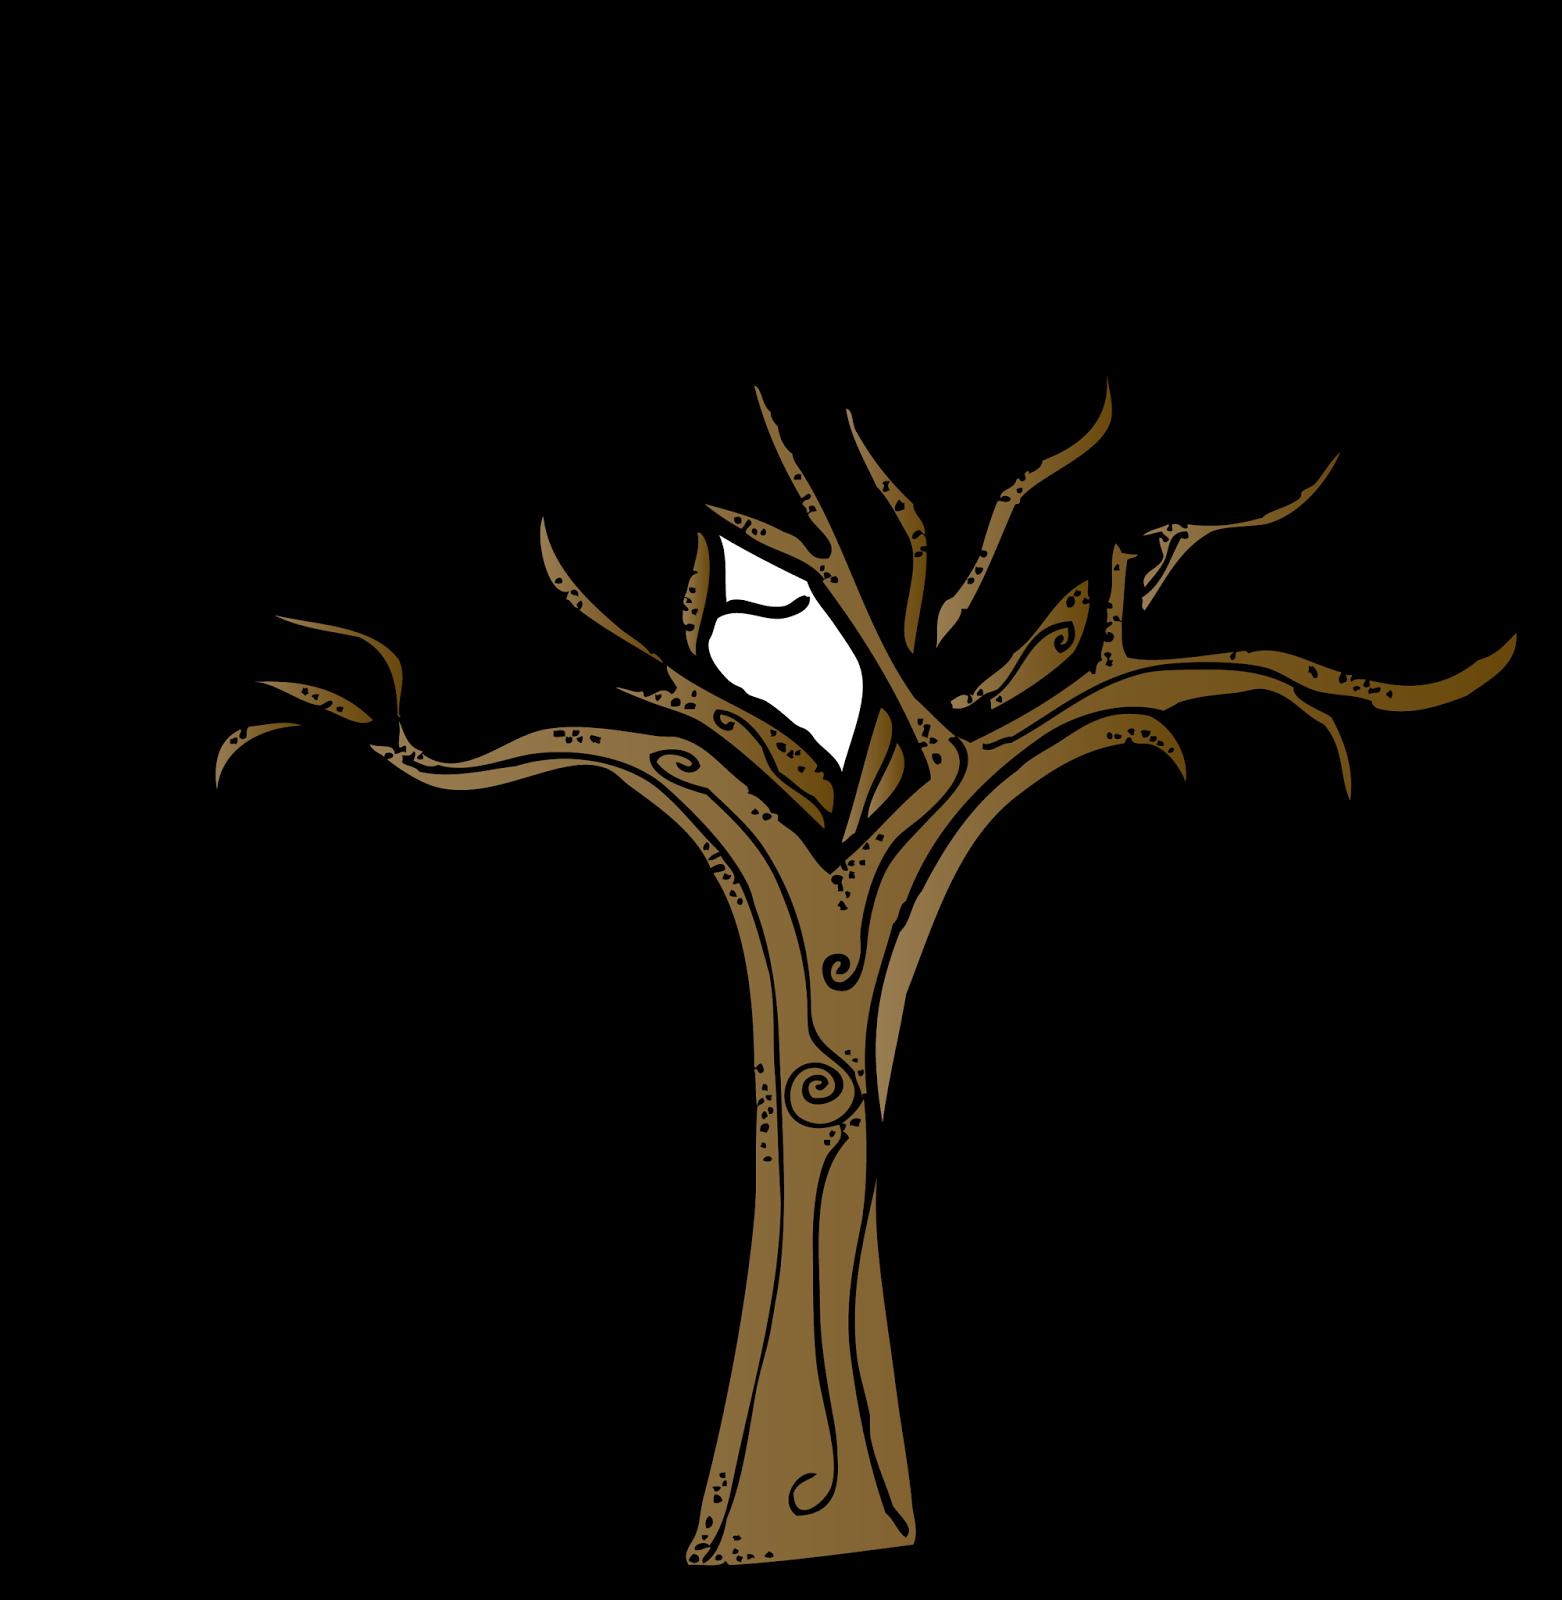 ... Dead Tree Trunk Clip Art u2013 Clipart Free Download ...